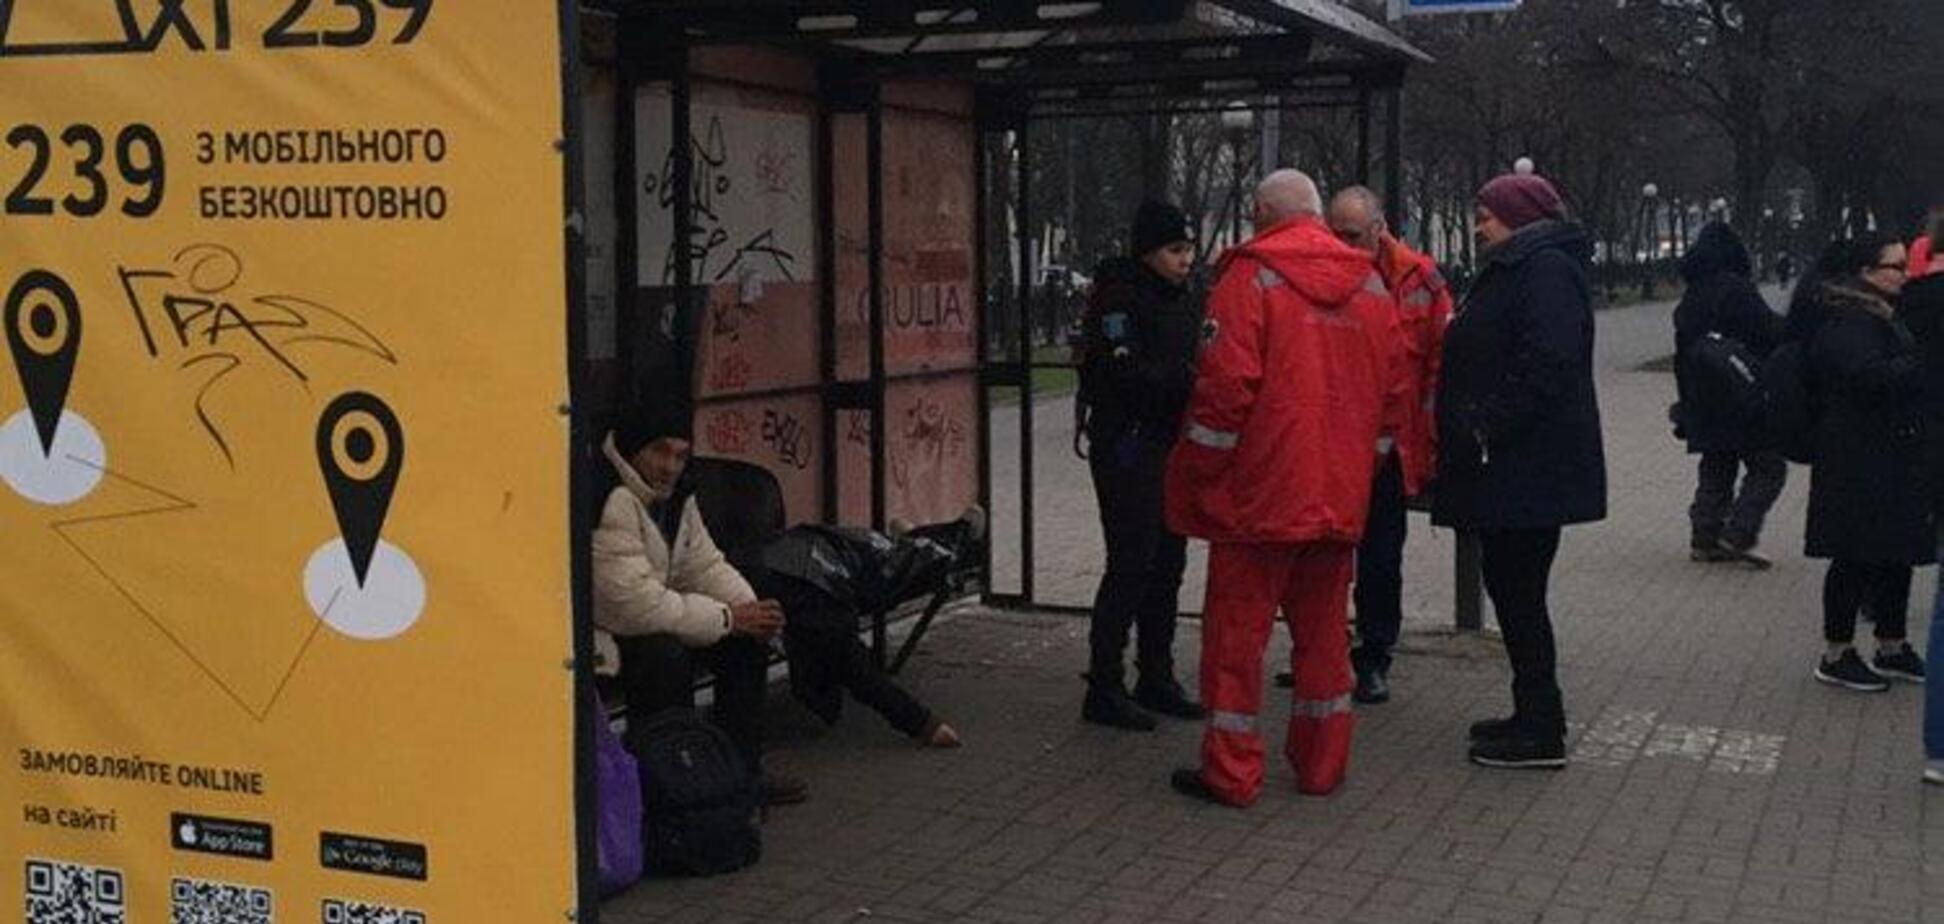 В Днепре в трамвае внезапно умерла женщина: фото с места